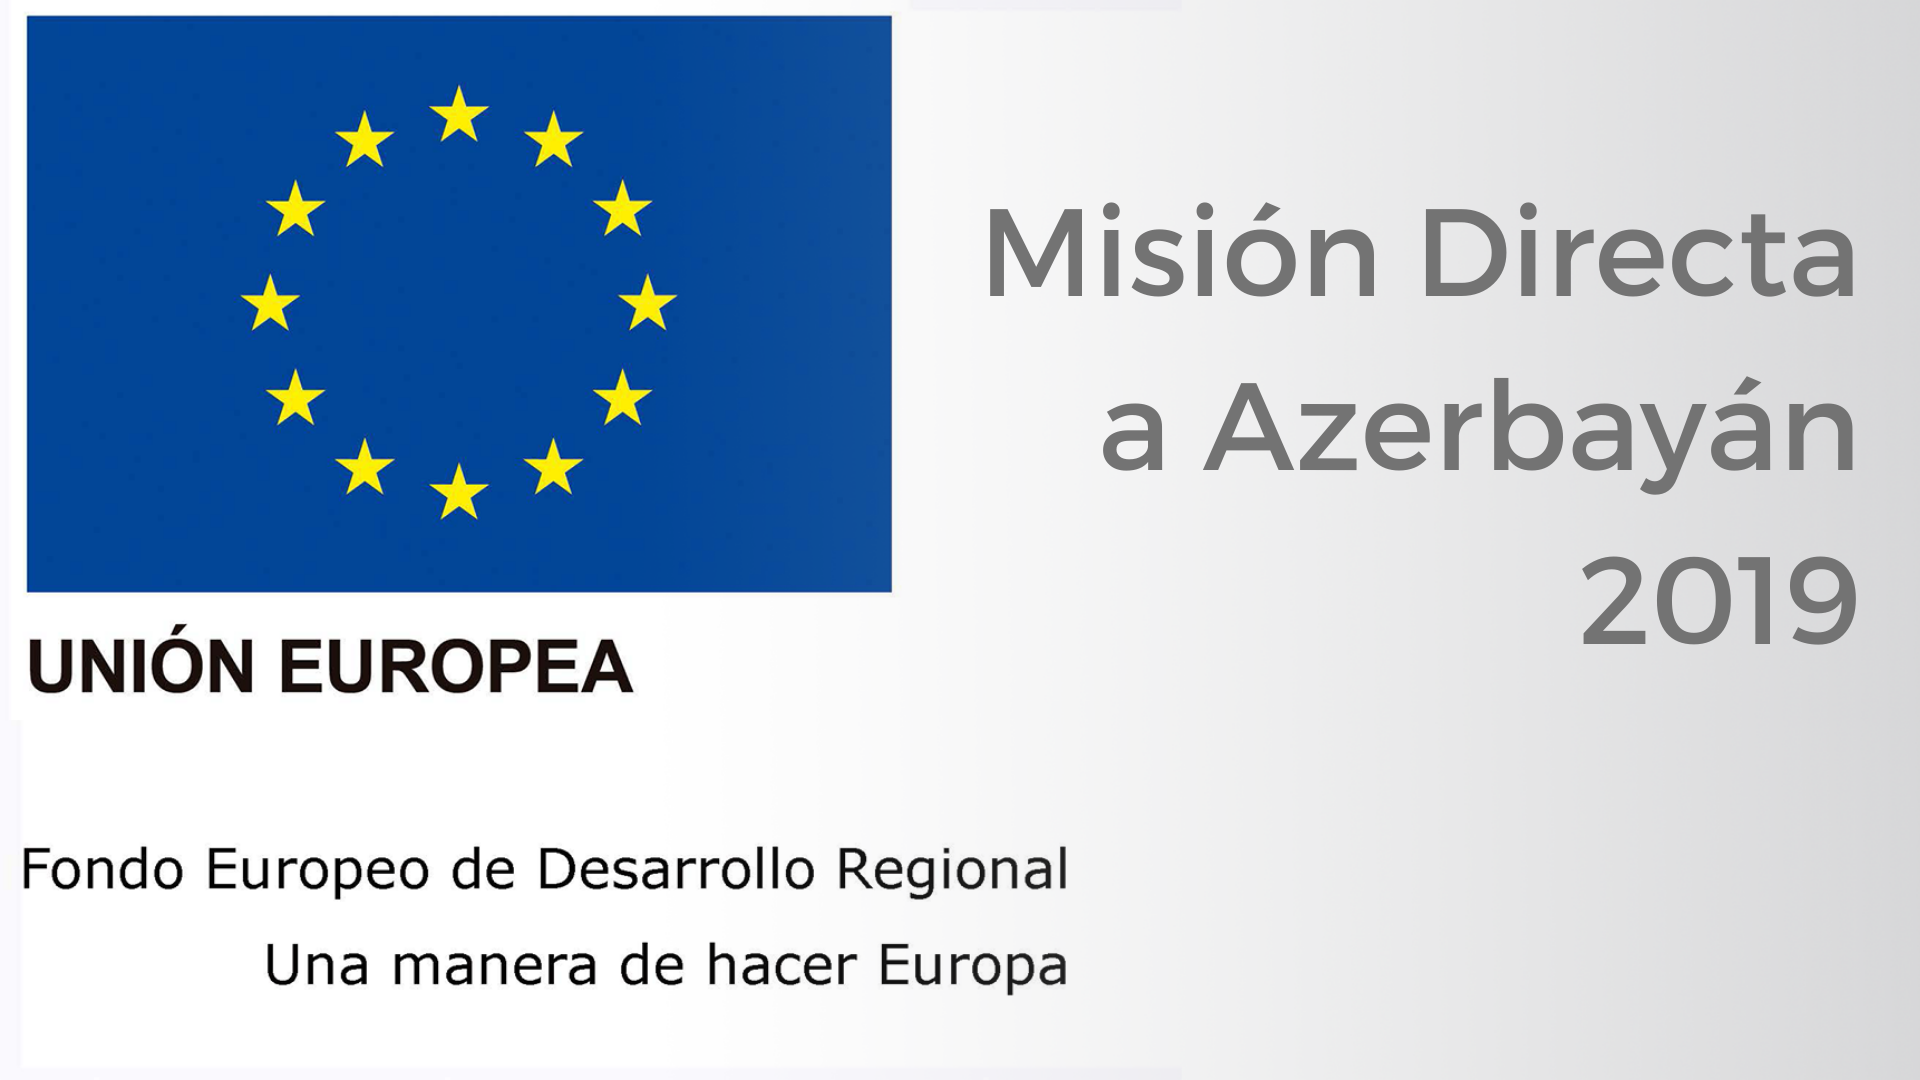 Mision directa azerbayan 2019